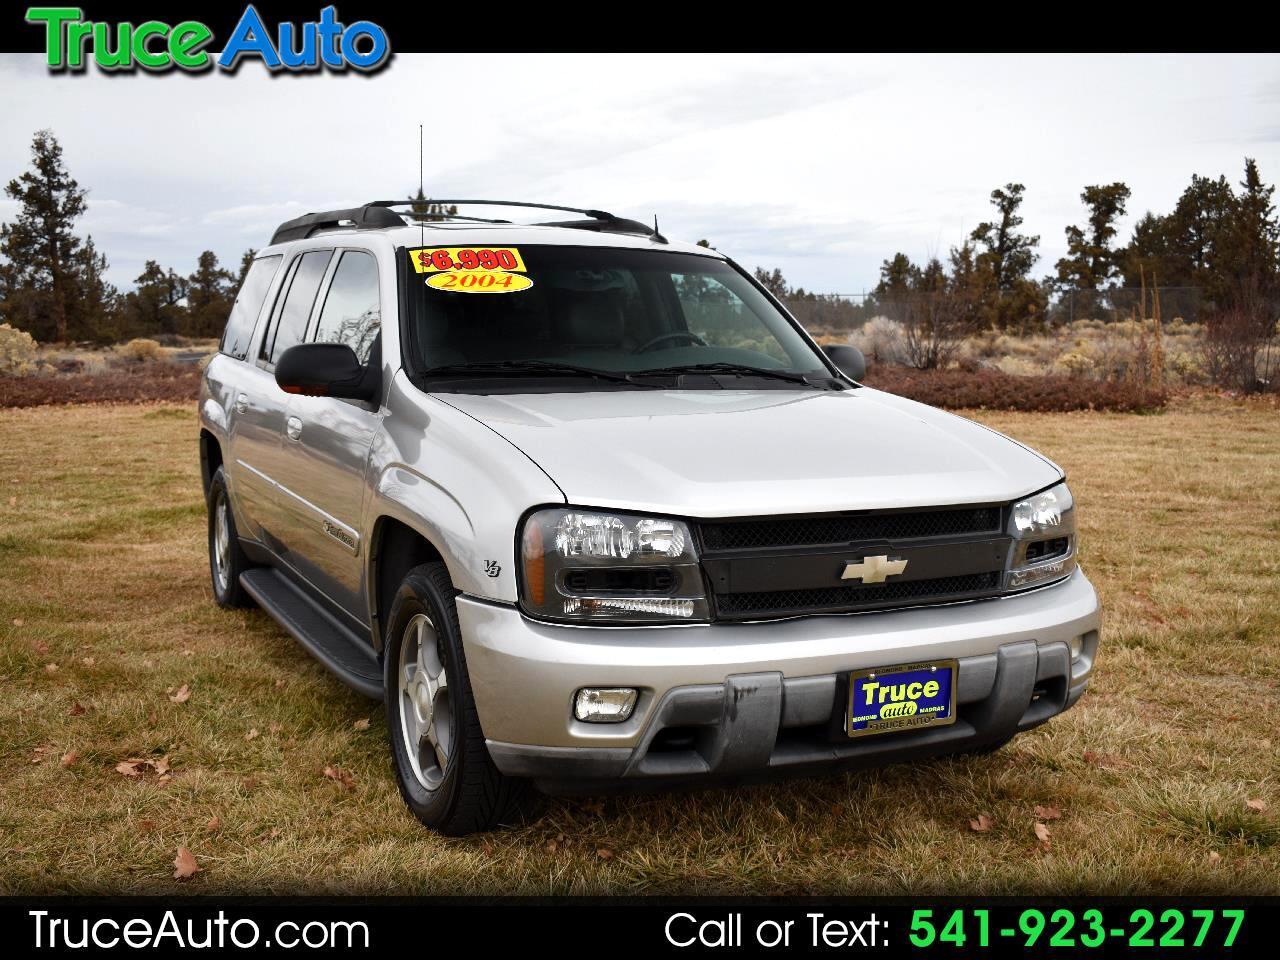 2004 Chevrolet TrailBlazer EXT LT 4WD ***LOW MILE***